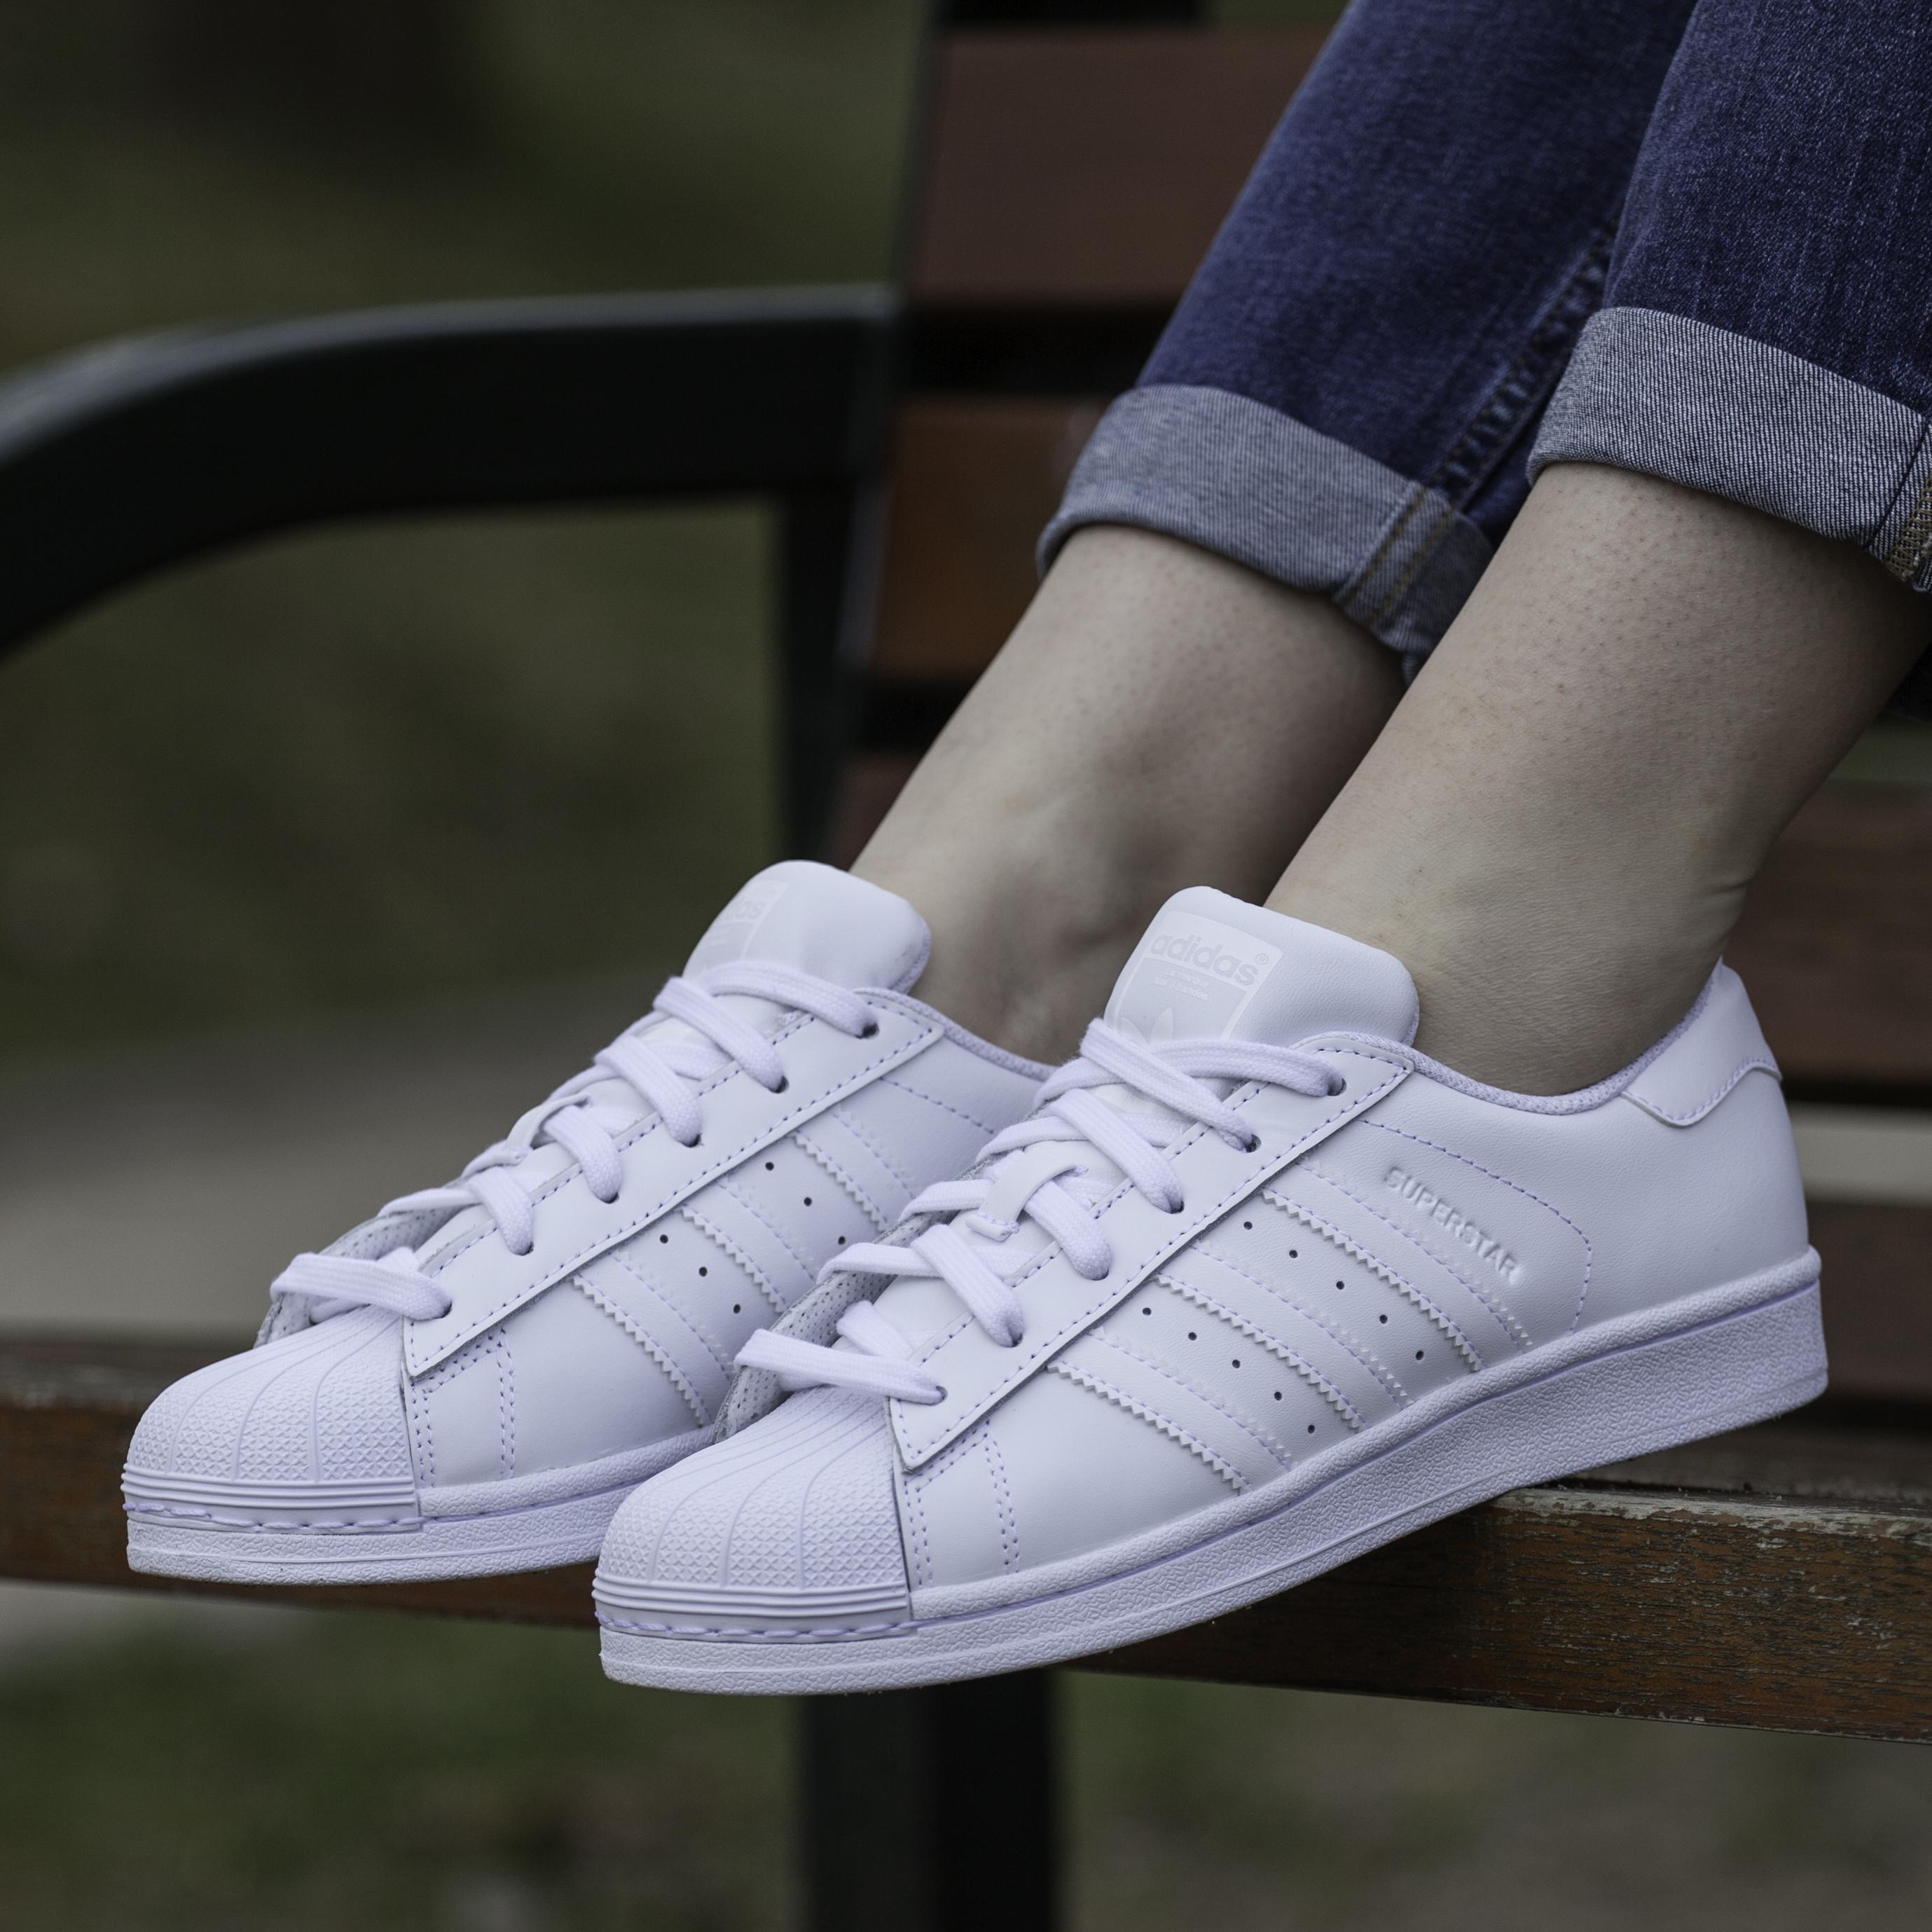 quality design 26bad dffa5 Adidas Superstar (White  Black) End